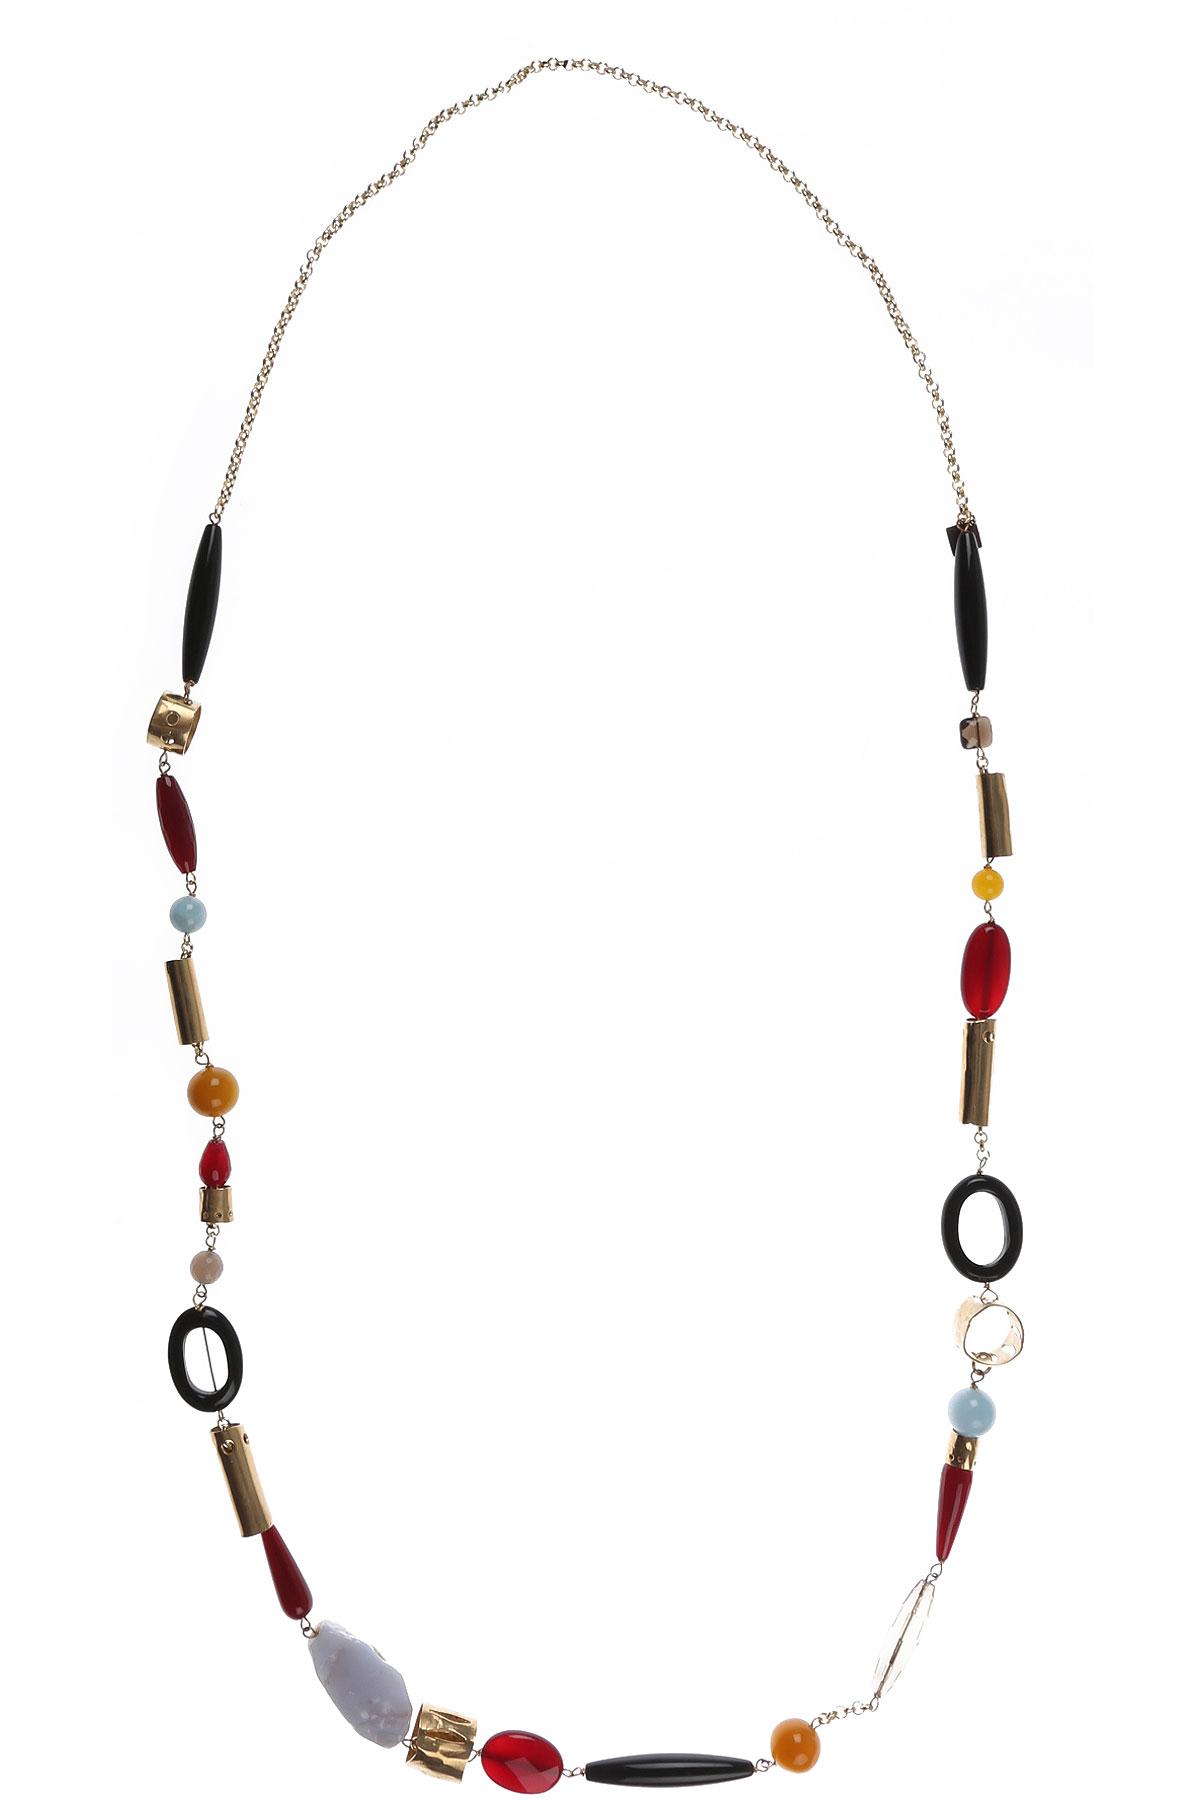 Iron By Miriam Nori Necklaces On Sale, Bordeaux, Bronze, 2019